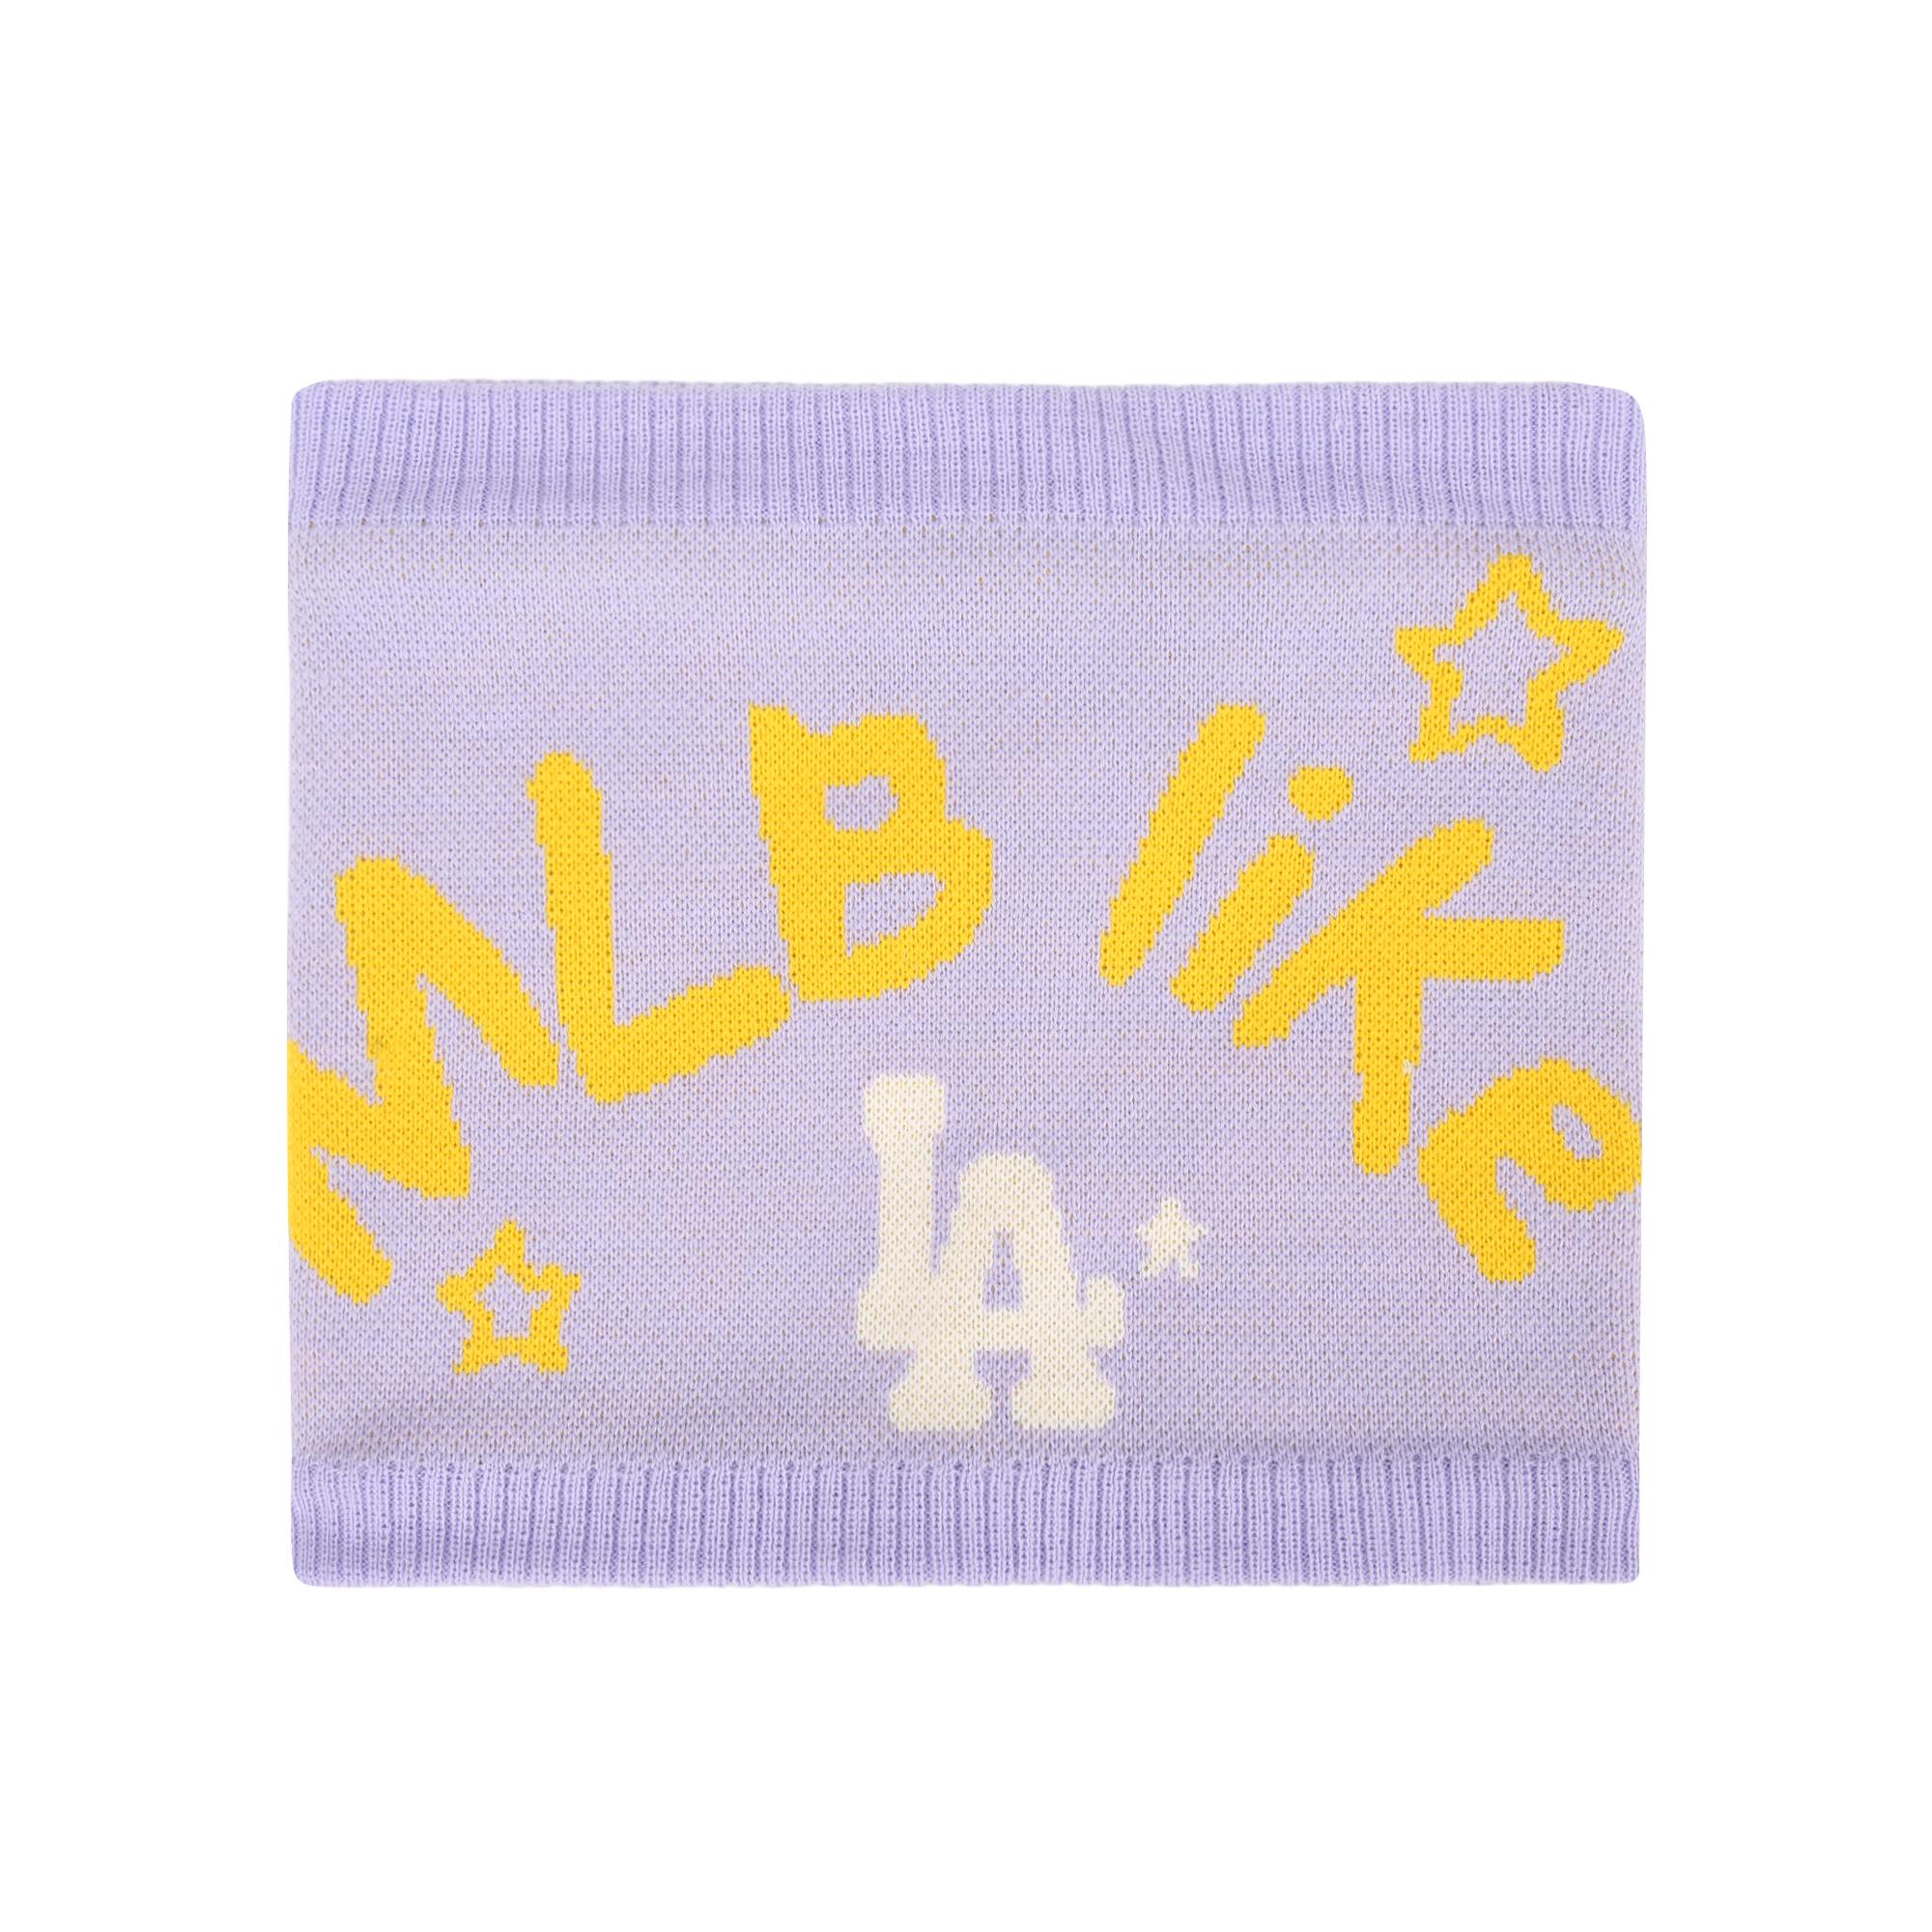 MLB LIKE 탁텔사 JQD 넥워머 LA다저스